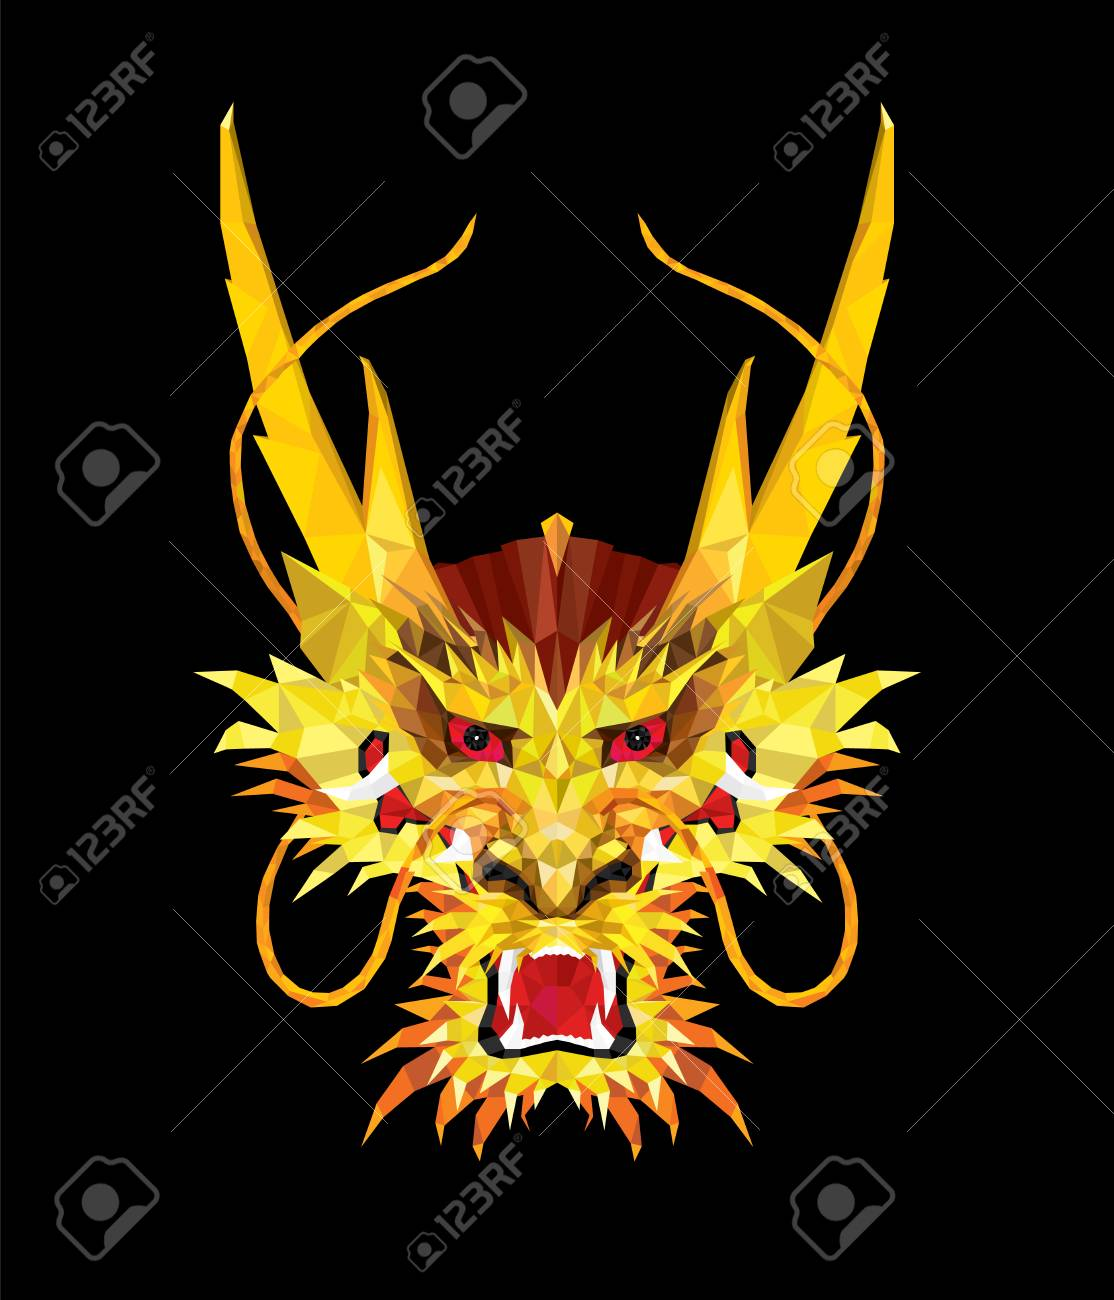 Aggressive Asian Dragon in low polygon style, Geometric pattern,